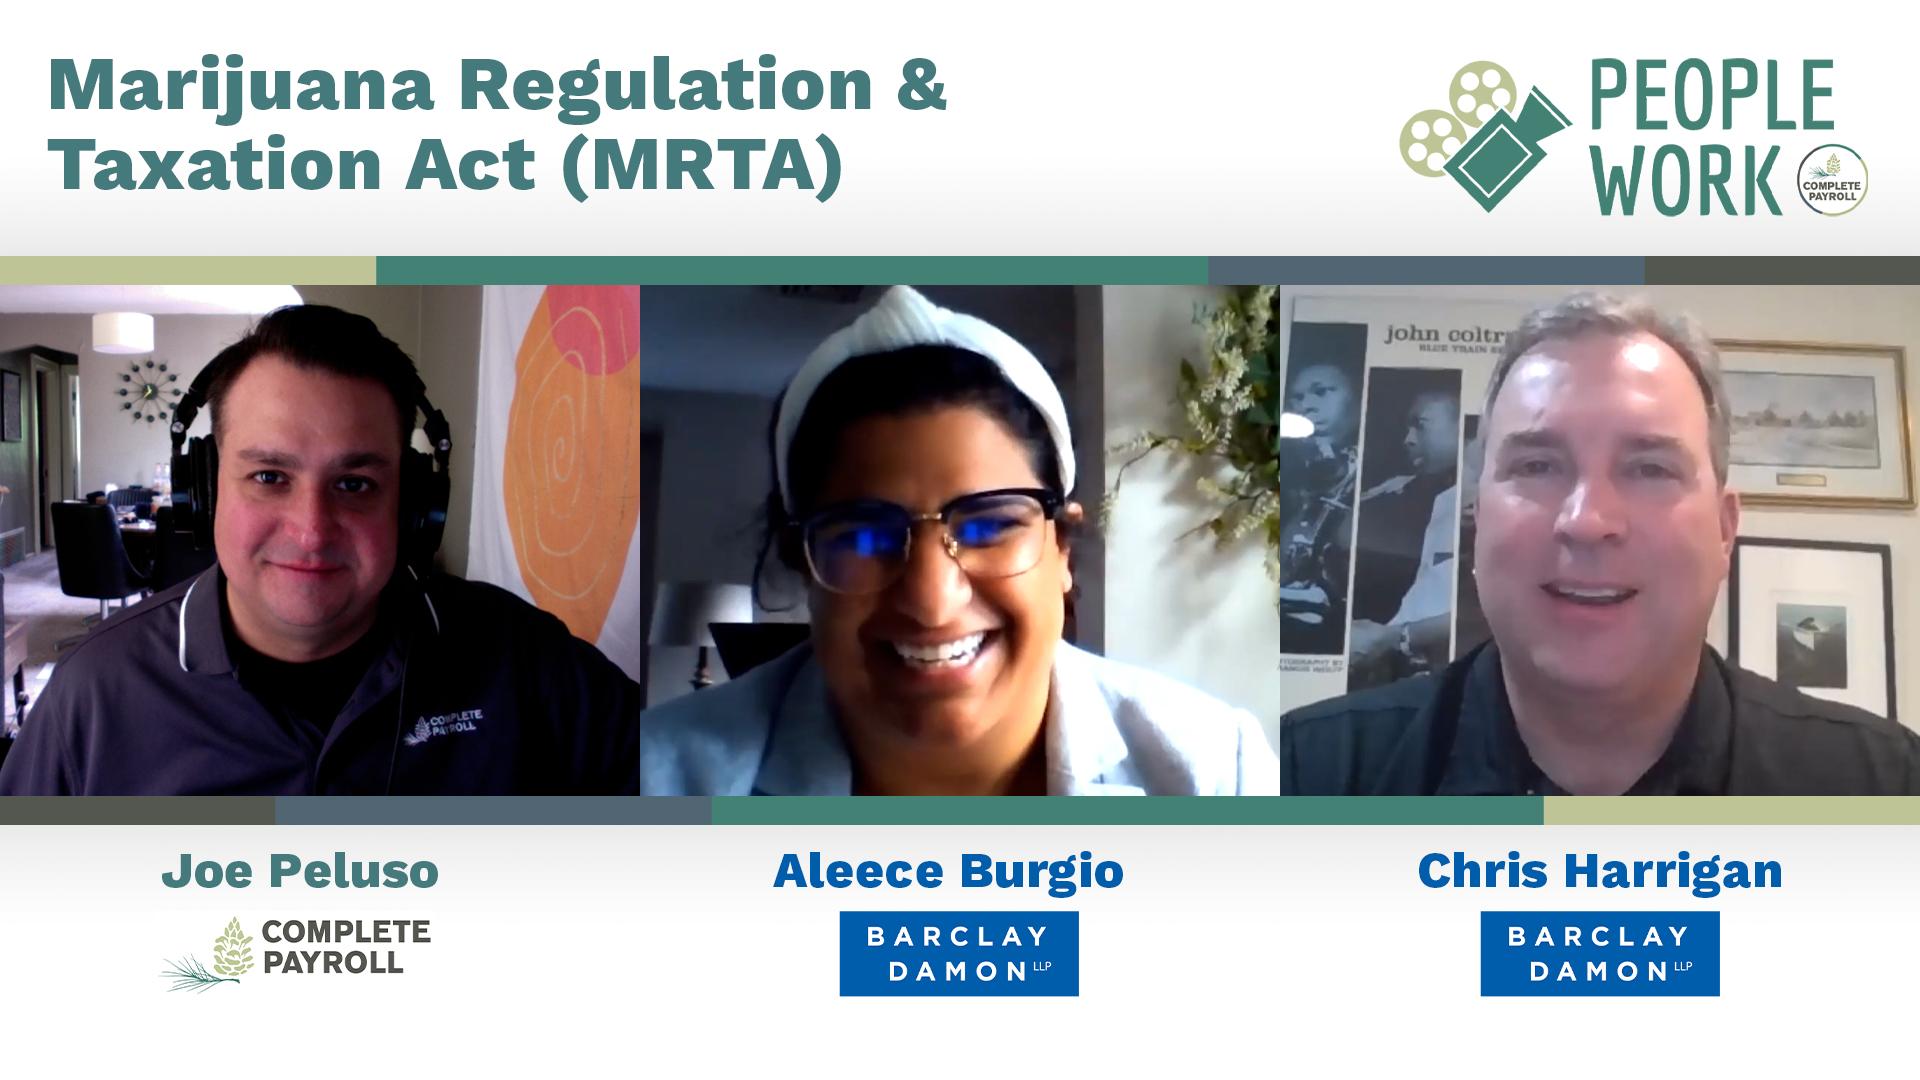 Aleece Burgio and Chris Harrigan from Barclay Damon LLP join our Marketing Coordinator Joe Peluso to discuss NY State's Marijuana Regulation and Taxation Act (MRTA).